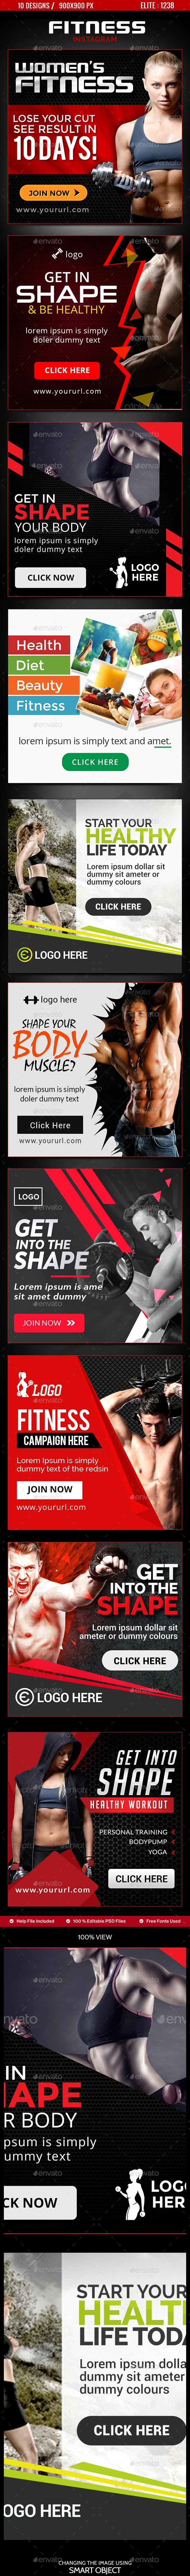 Fitness Instagram Templates  - 10 Designs - Social Media Web Elements